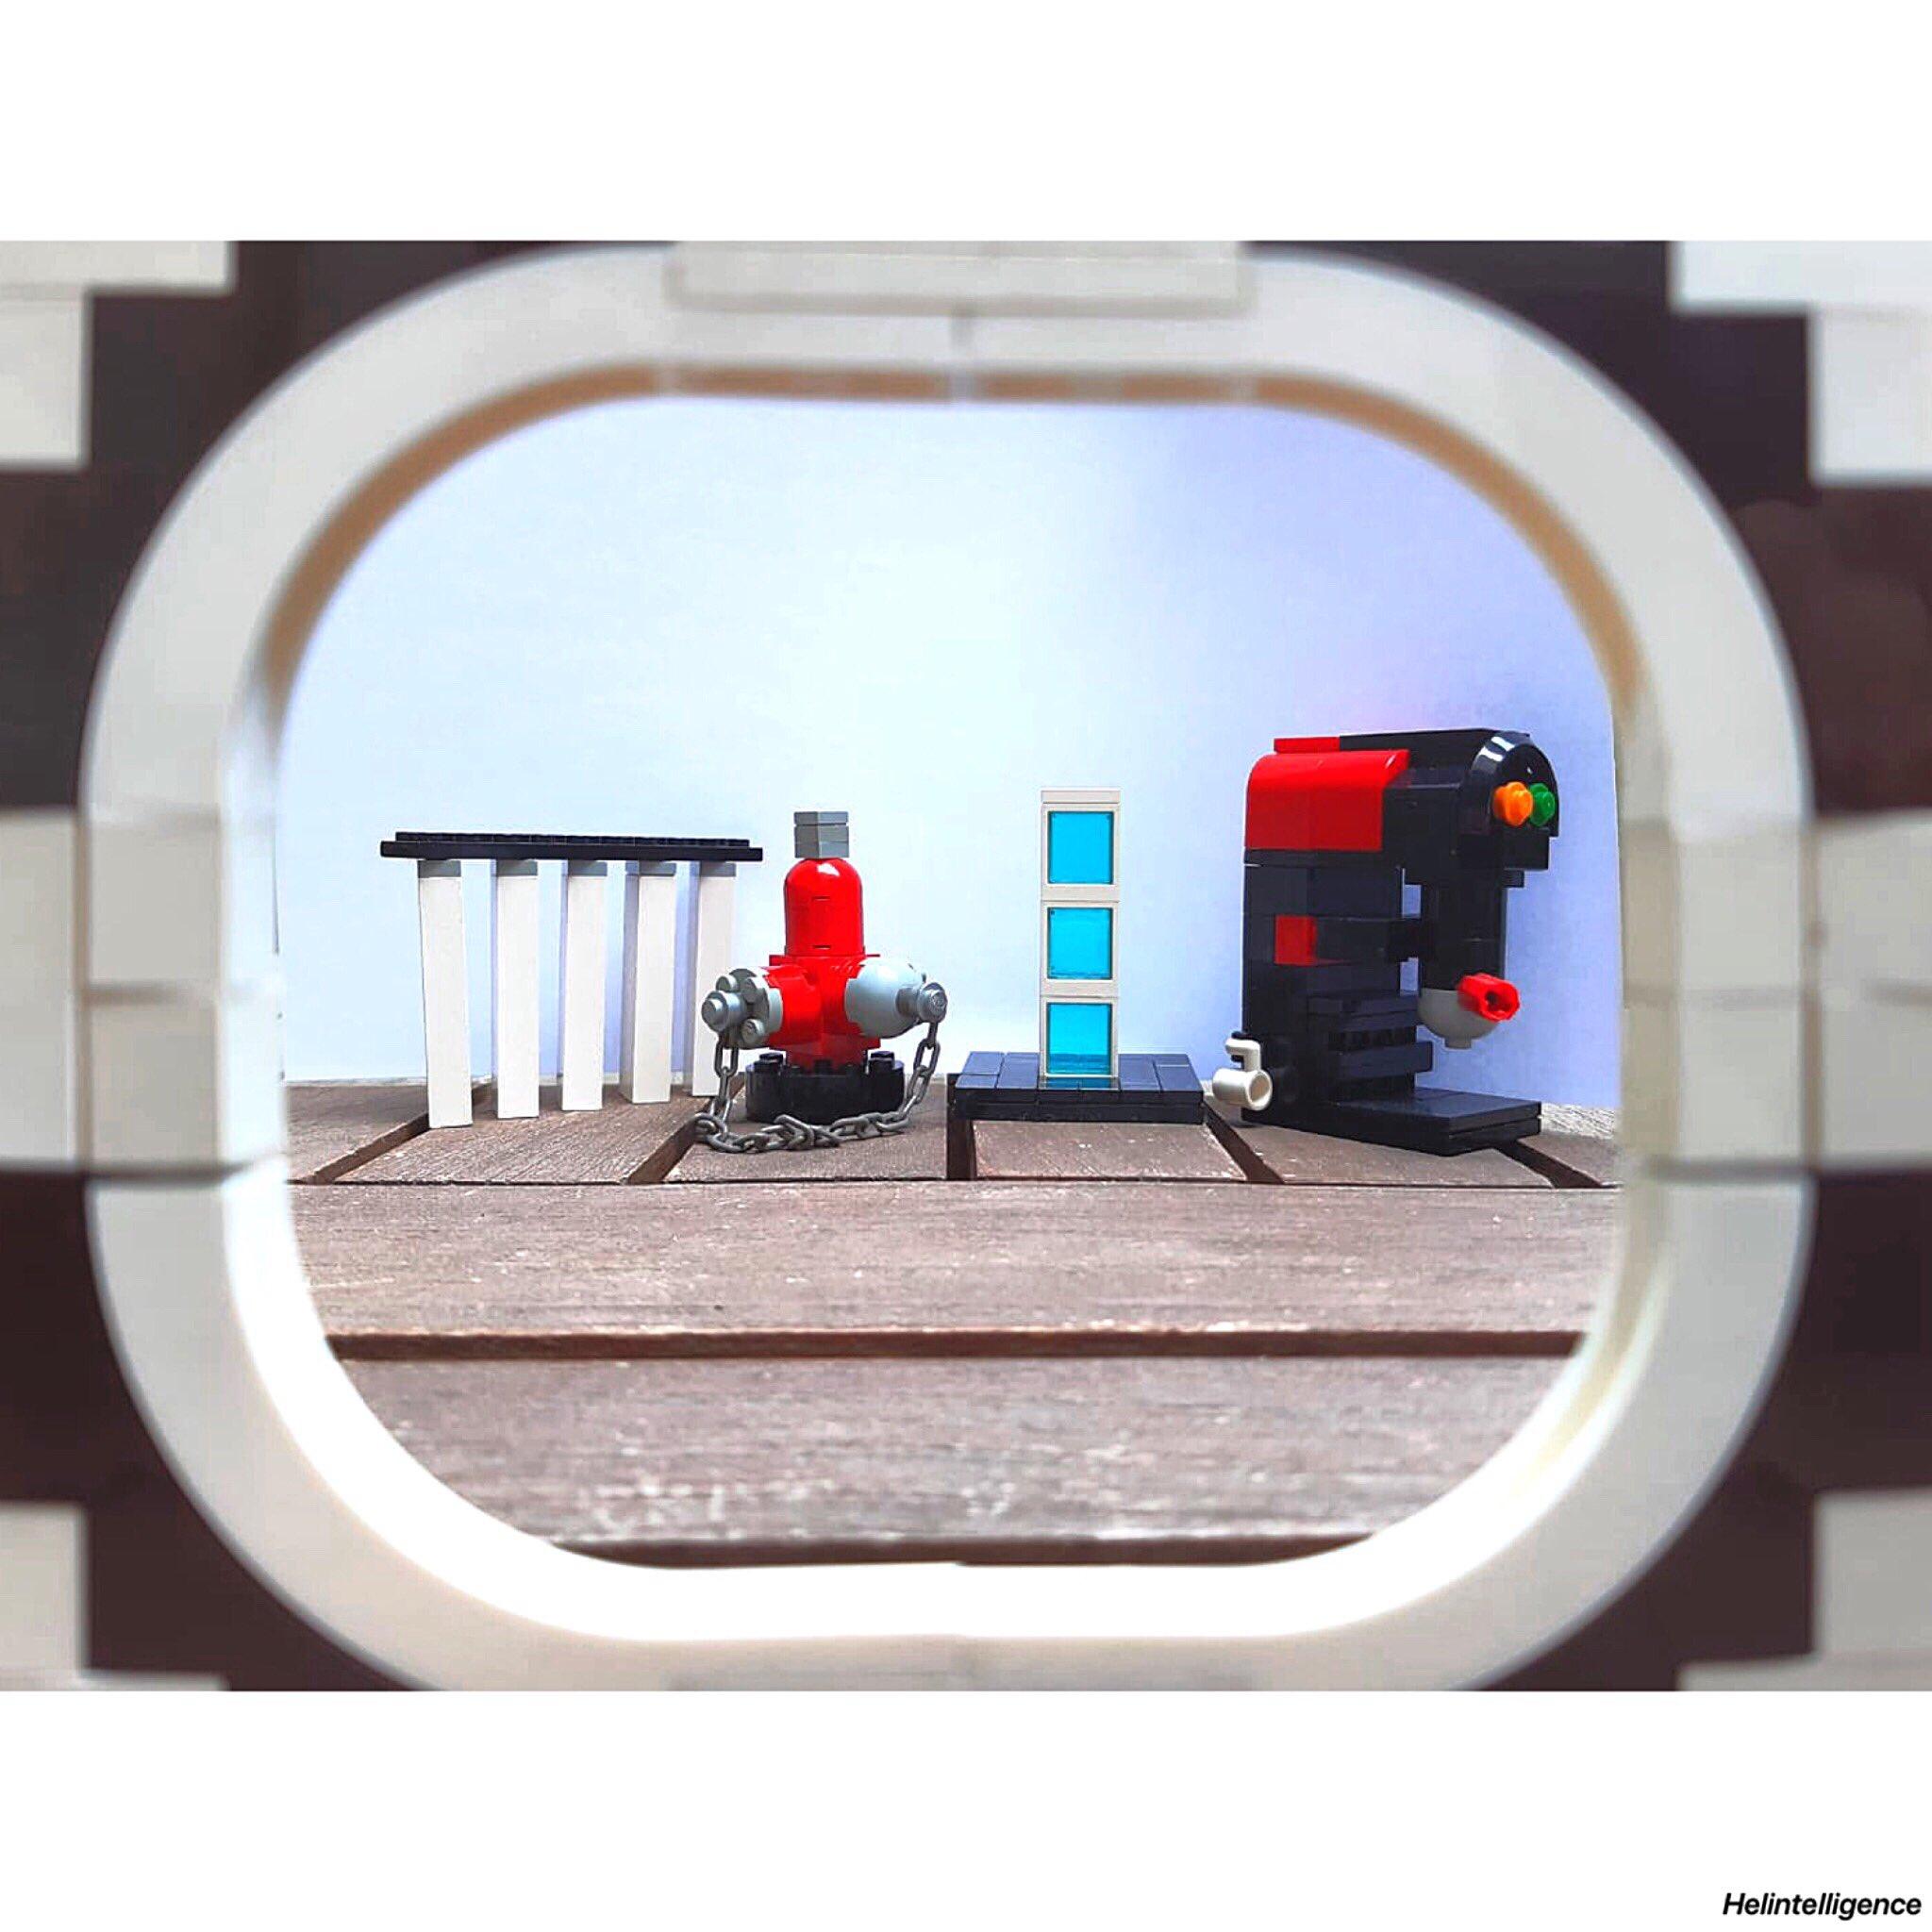 Mira lo que está pasando. Echa un vistazo a través de nuestra ventana de Helintelligence. Seguimos validando ideas con prototipos de Lego.   #legoart #emprendedor #startup #pymes #Negocios #businessgrowth #design #Entrepreneur #pasión #strategy https://t.co/wEFO0rMvIN